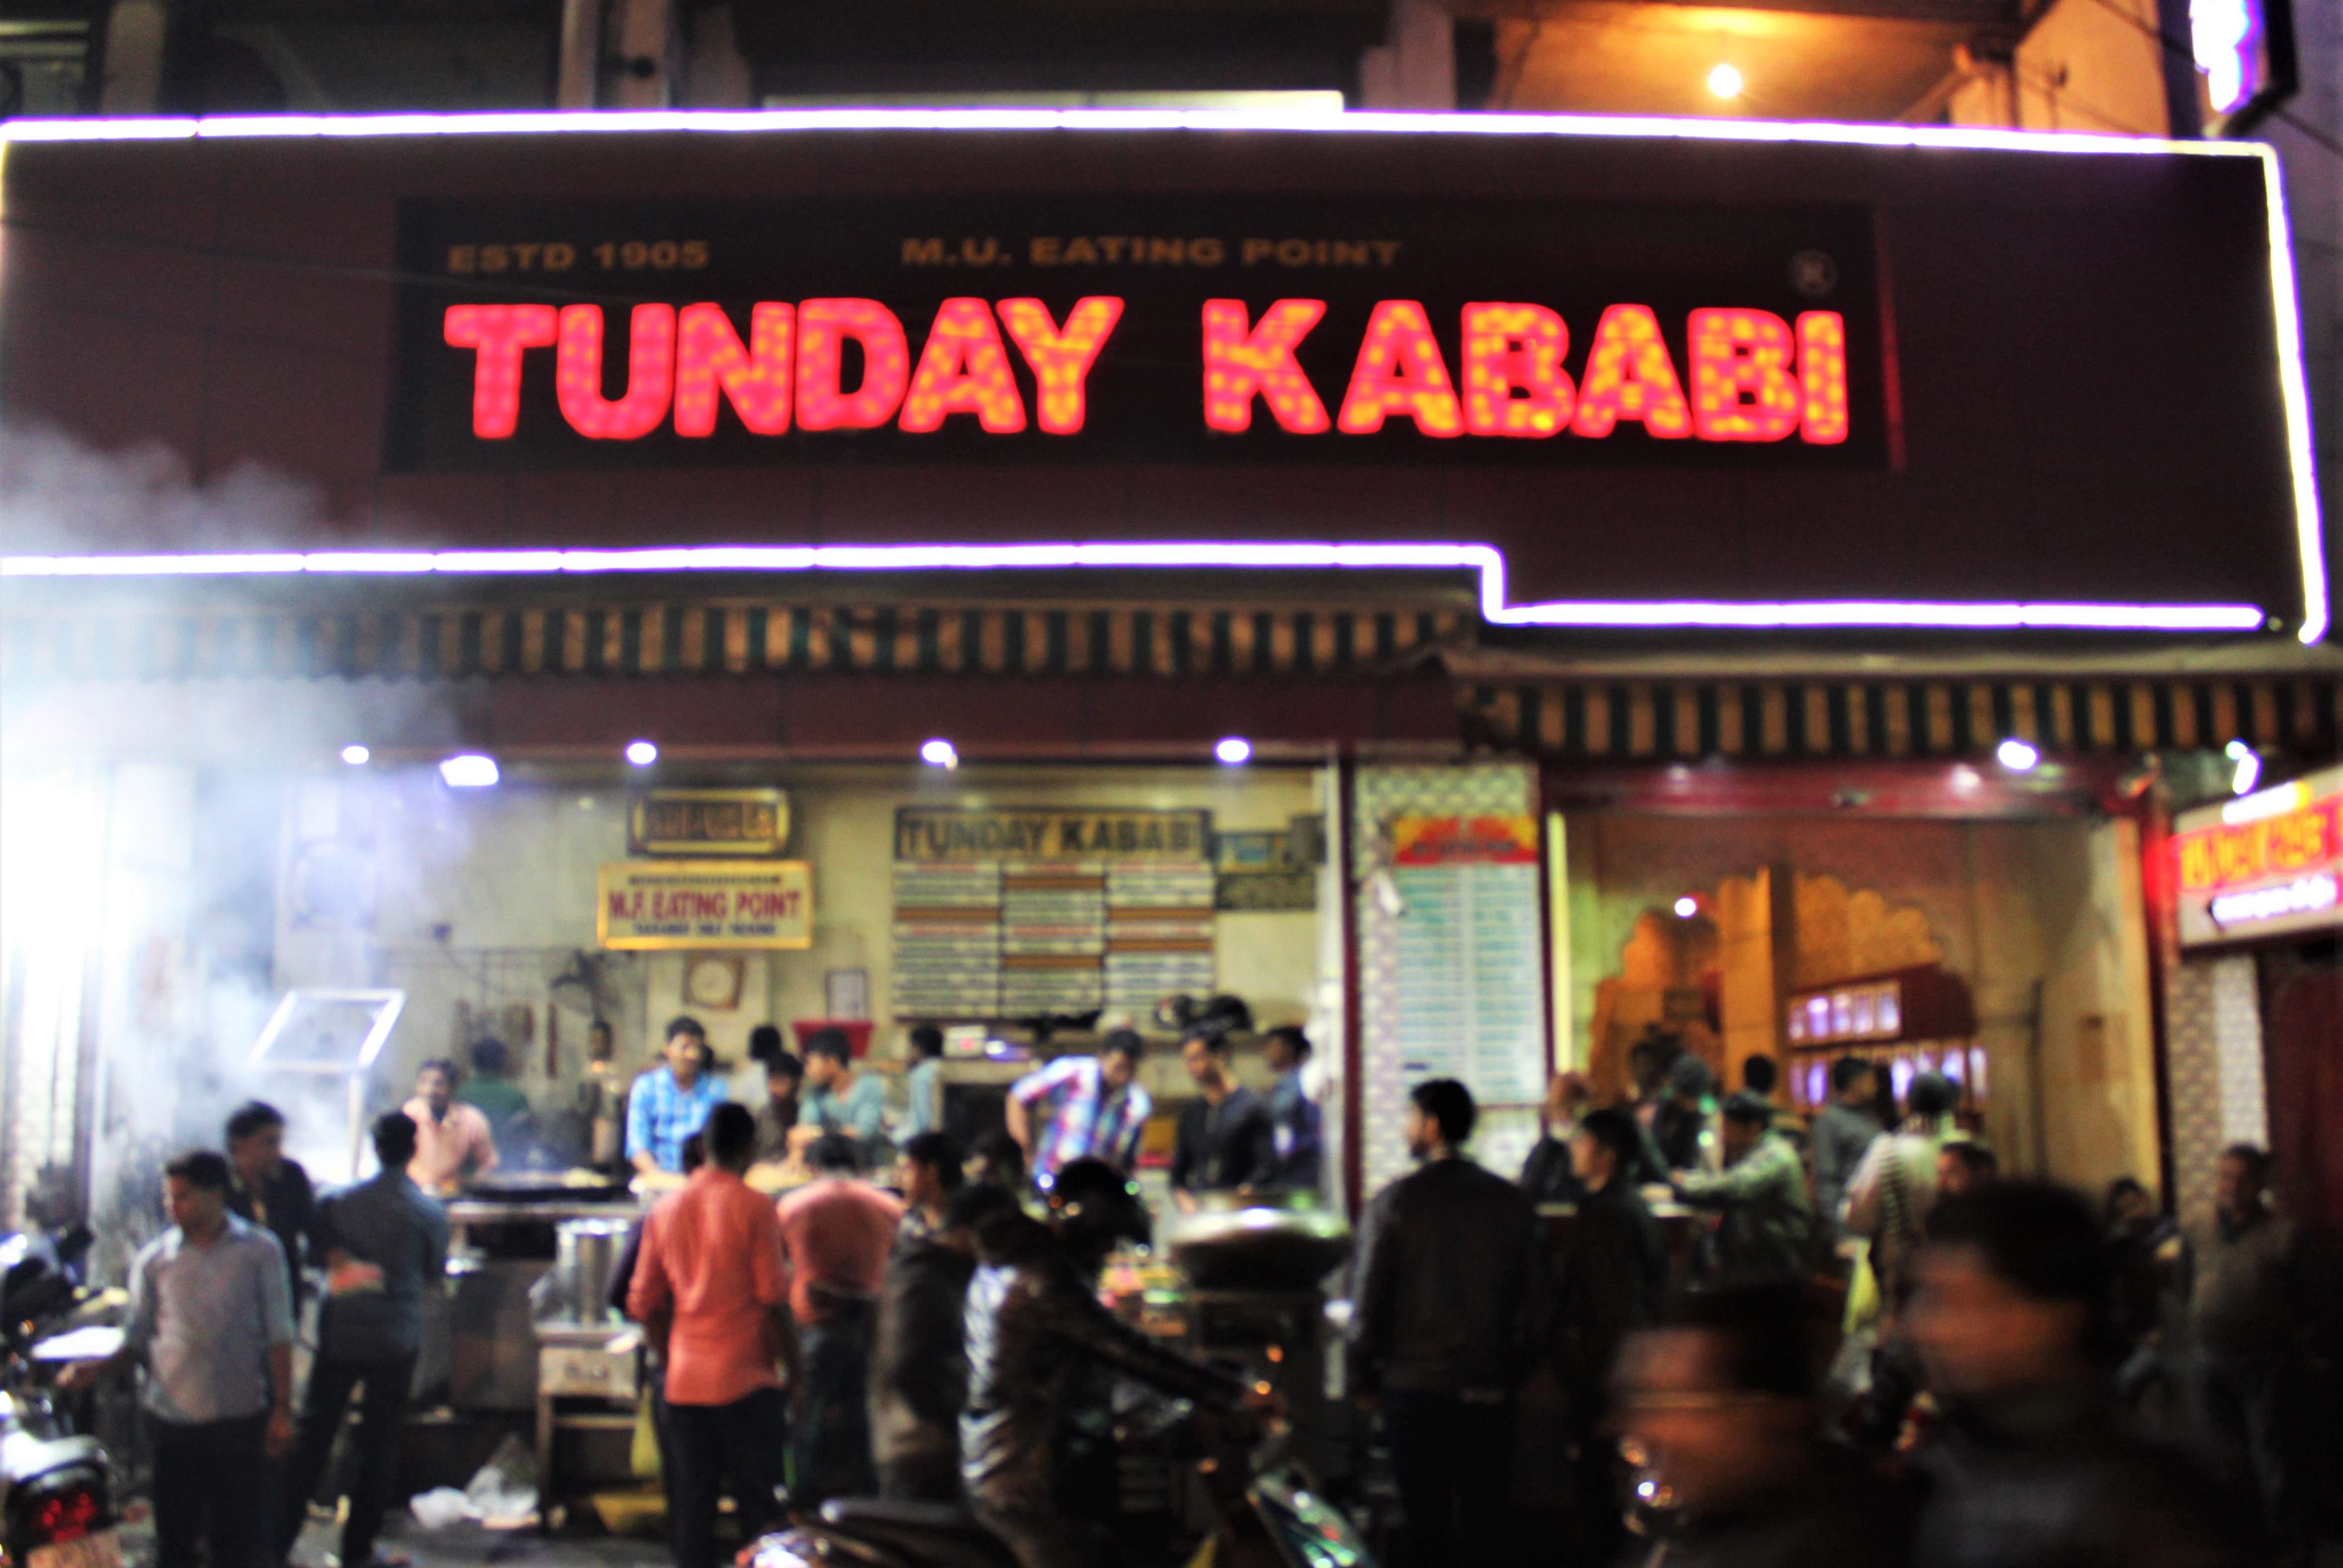 The famous Tunday Kababi - Aminabad outlet